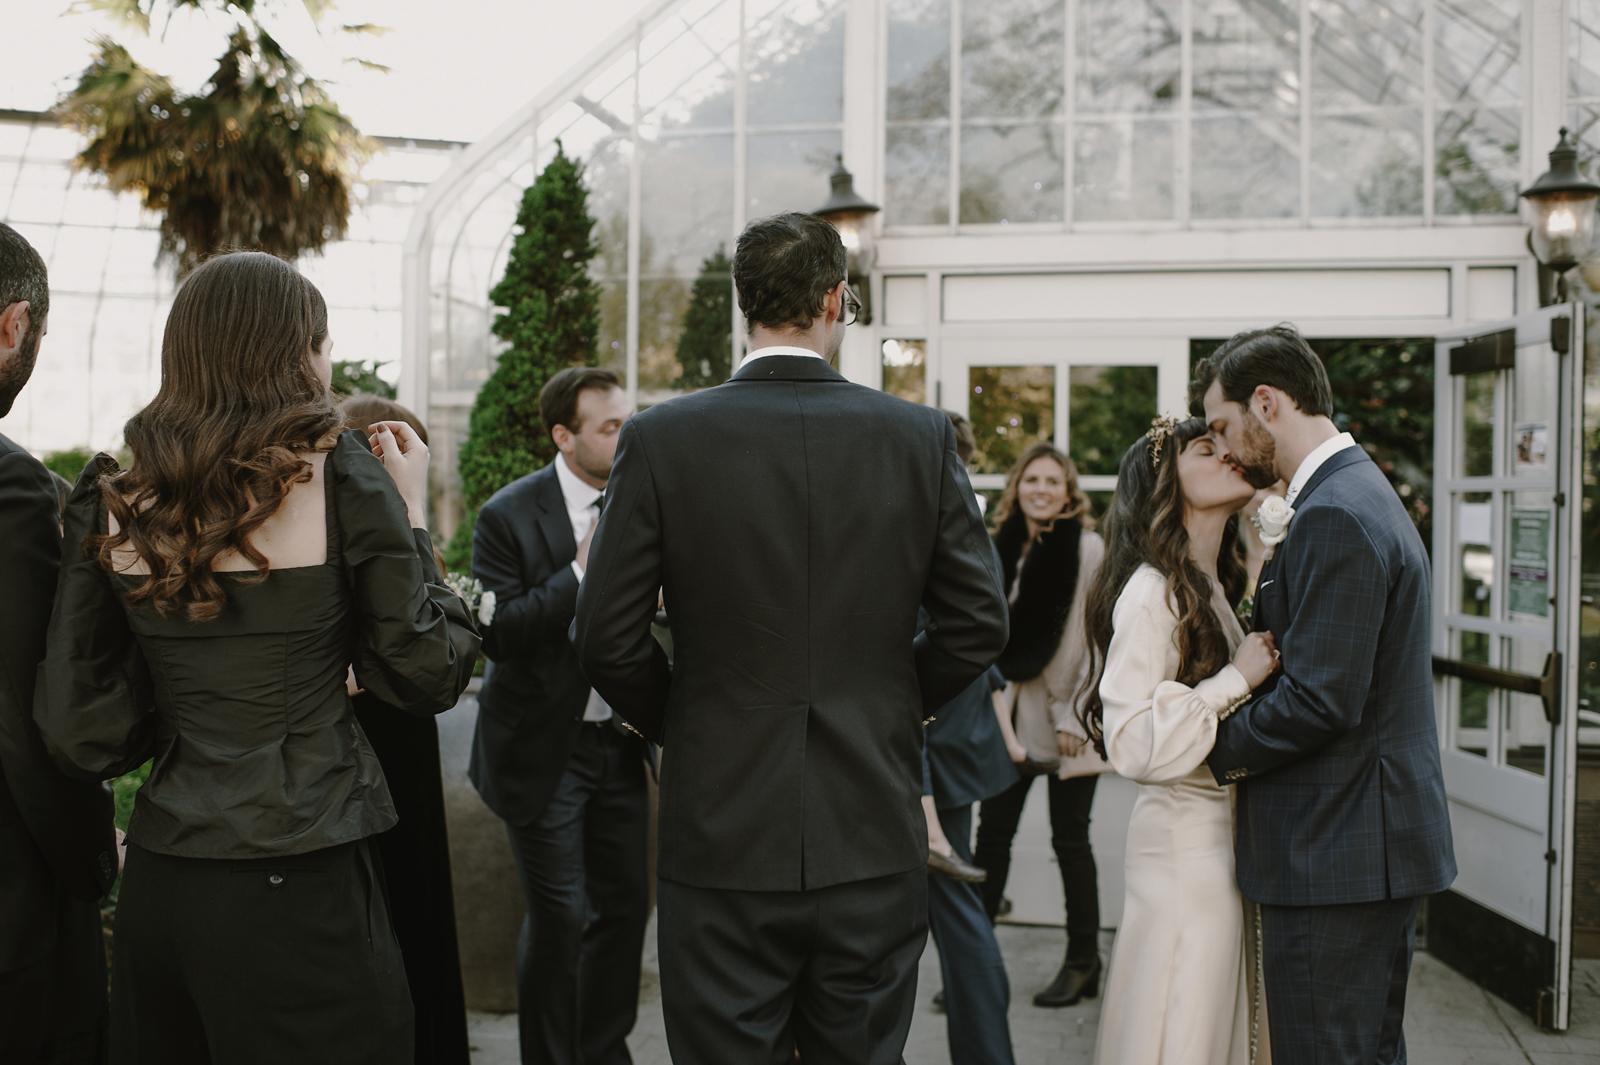 kristenmarieparker_tacoma_conservatory_warehouse_wedding054.JPG